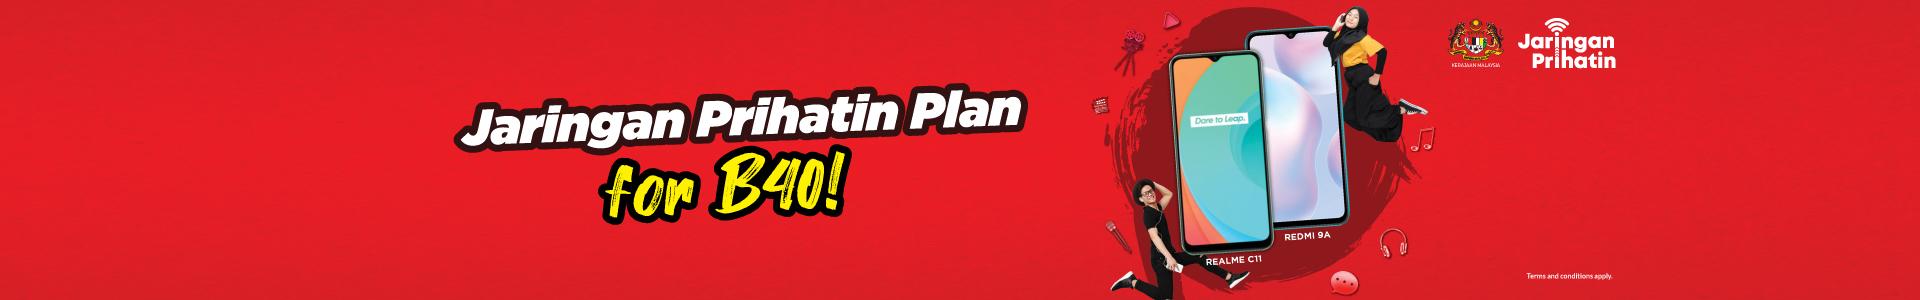 Get the exclusive redONE Jaringan Prihatin plan now!